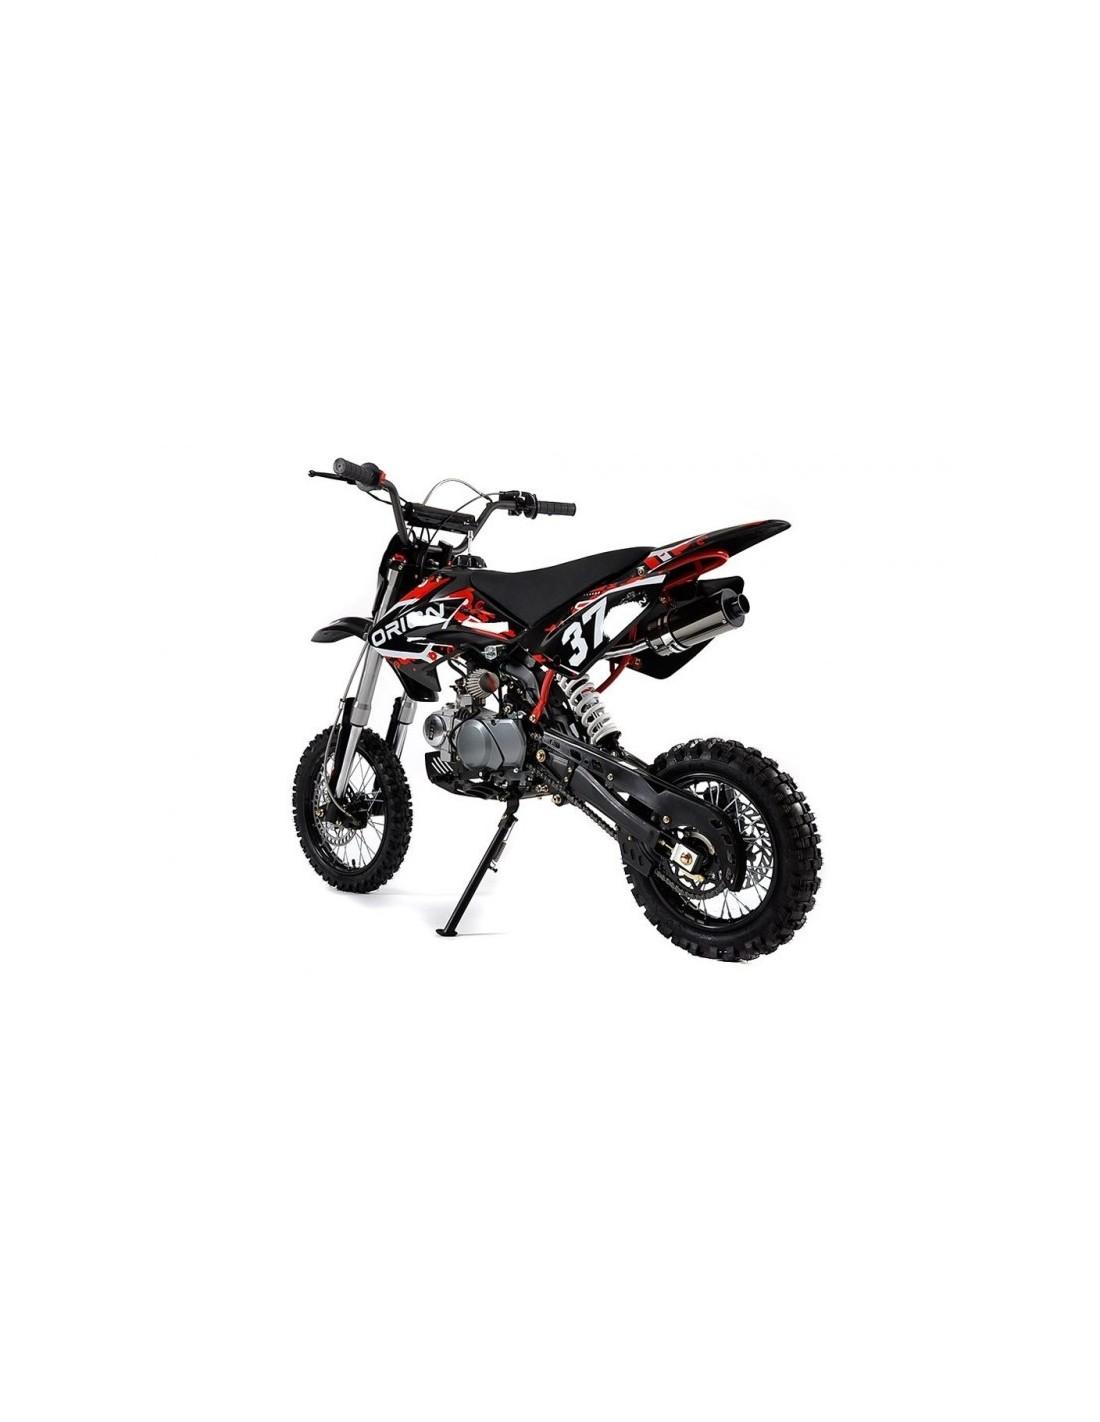 Dirt Bike 125cc ORION CRF 37 14/12 - MONSTER BIKE 62